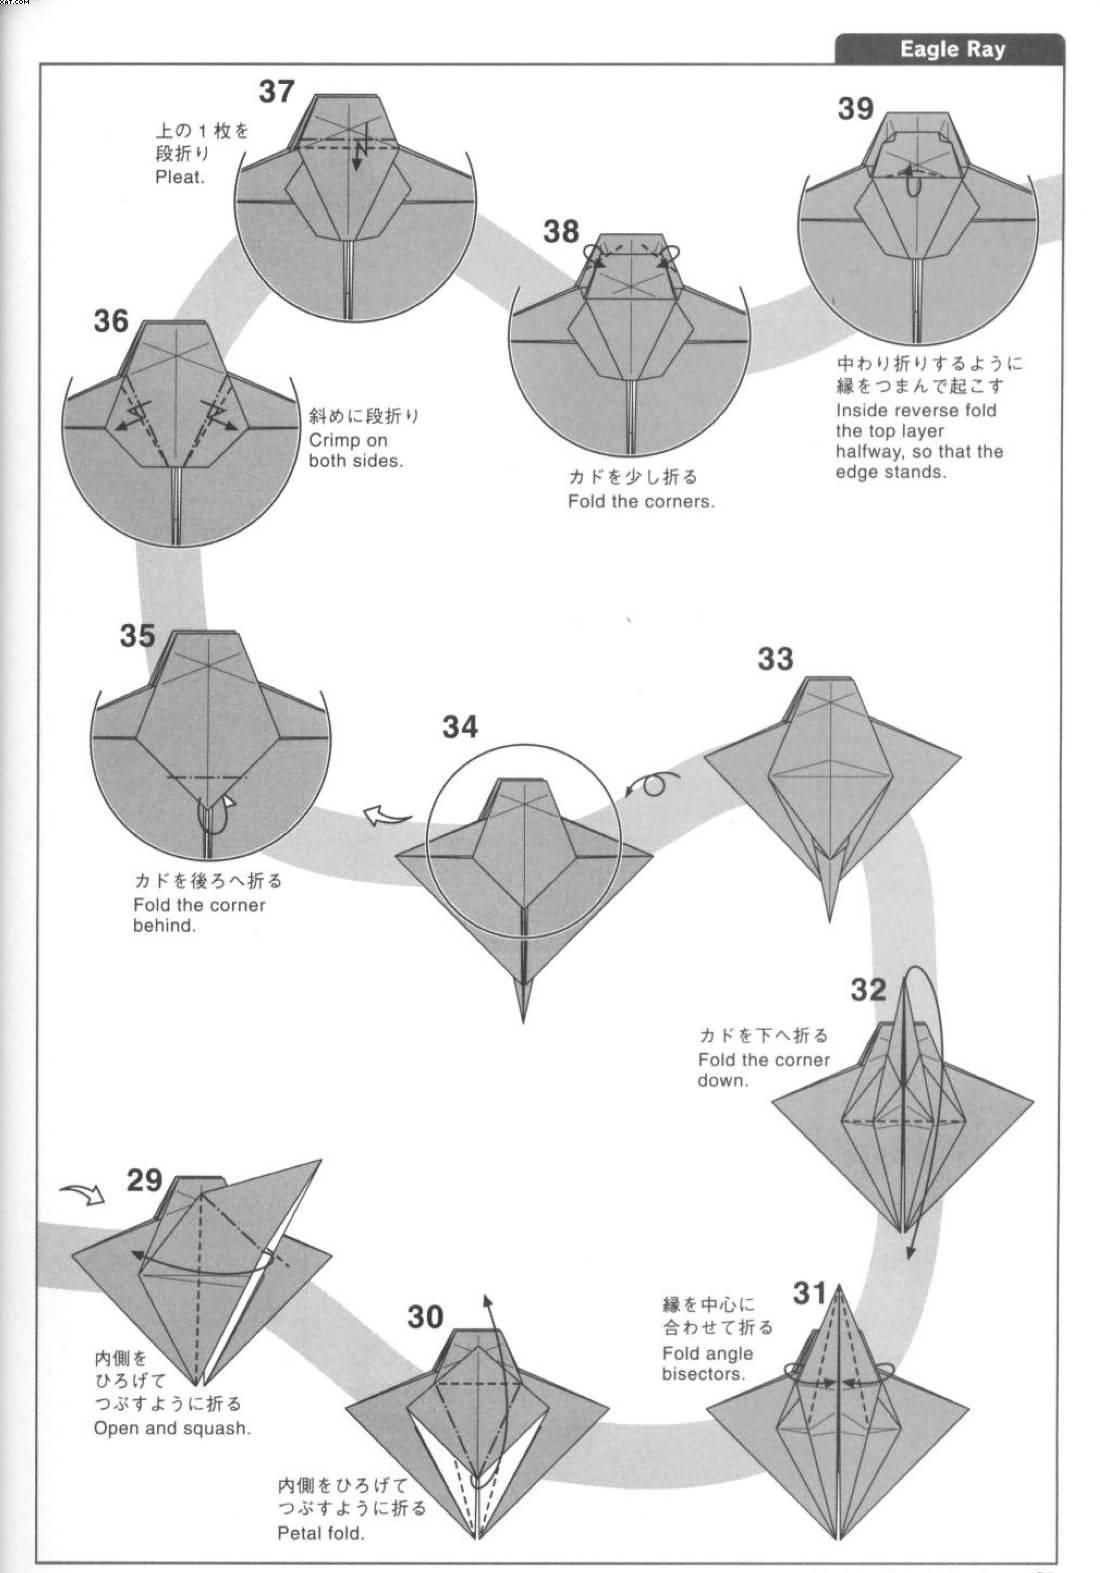 origami eagle instructions diagram royal enfield bullet wiring schematic library ray diseada por satoshi kamiya el arte del